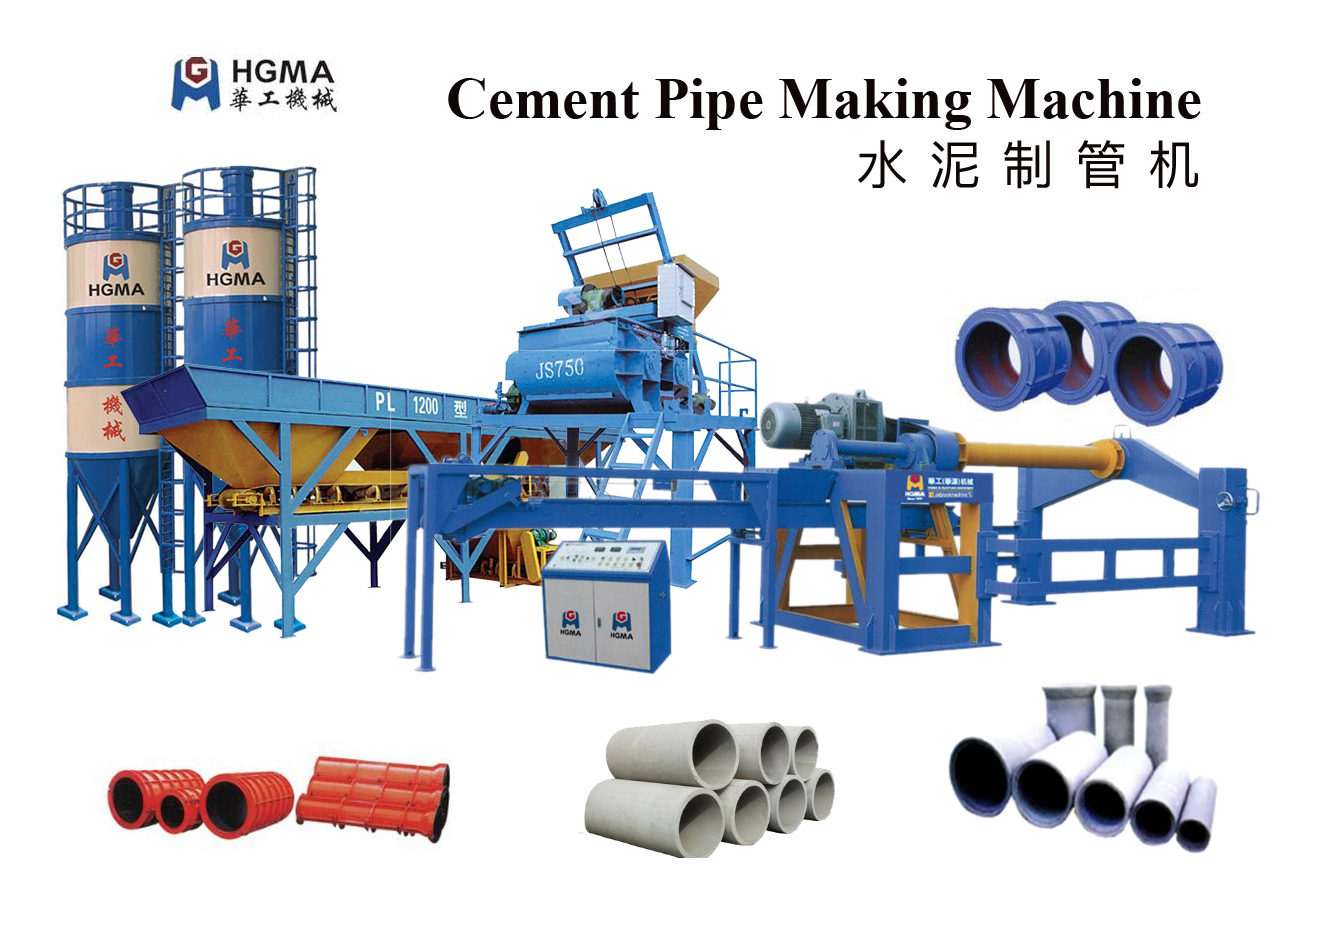 Cement pipe making machine